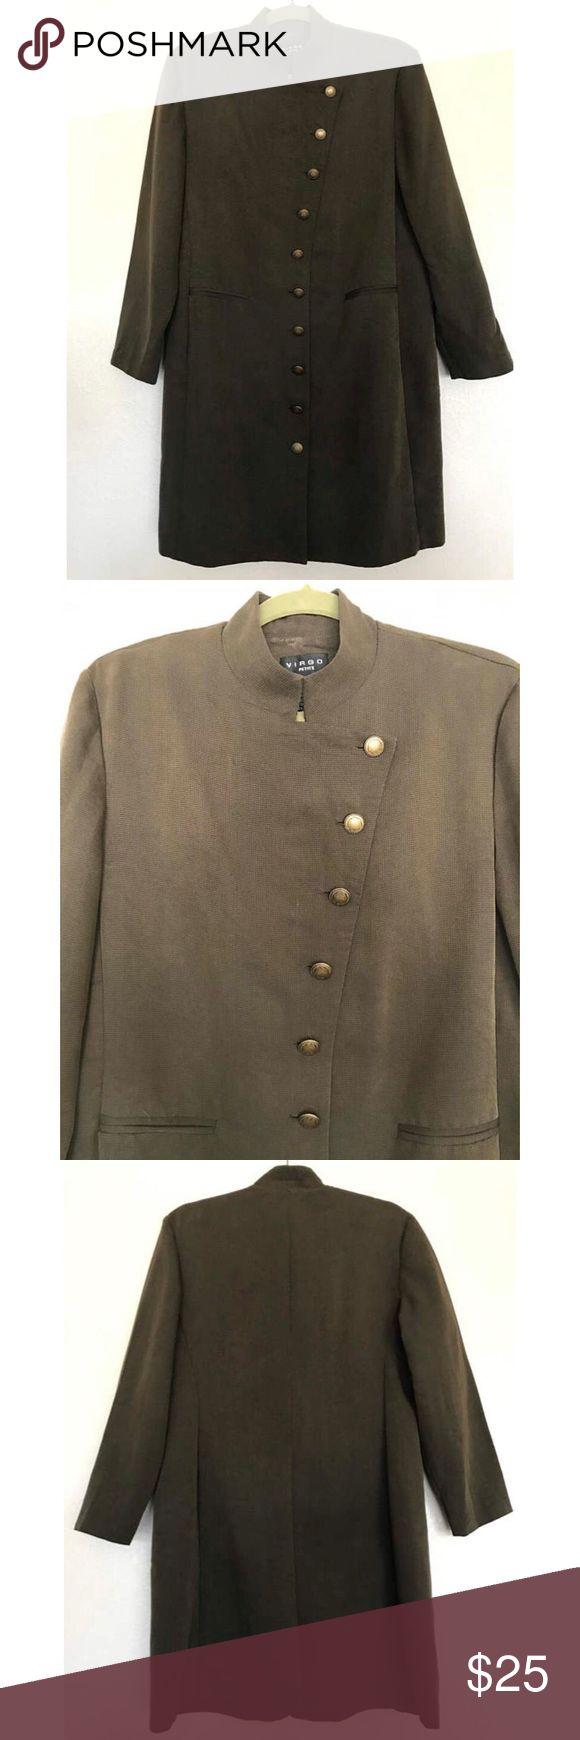 "Vintage Virgo petites coat Green Virgo petites coat.  70% Rayon 30% polyester  Tag size 14 Measurements: Bust 42"" Waist 40"" Hips 42"" Length 34"" shoulder to cuff 22"" Virgo Jackets & Coats"